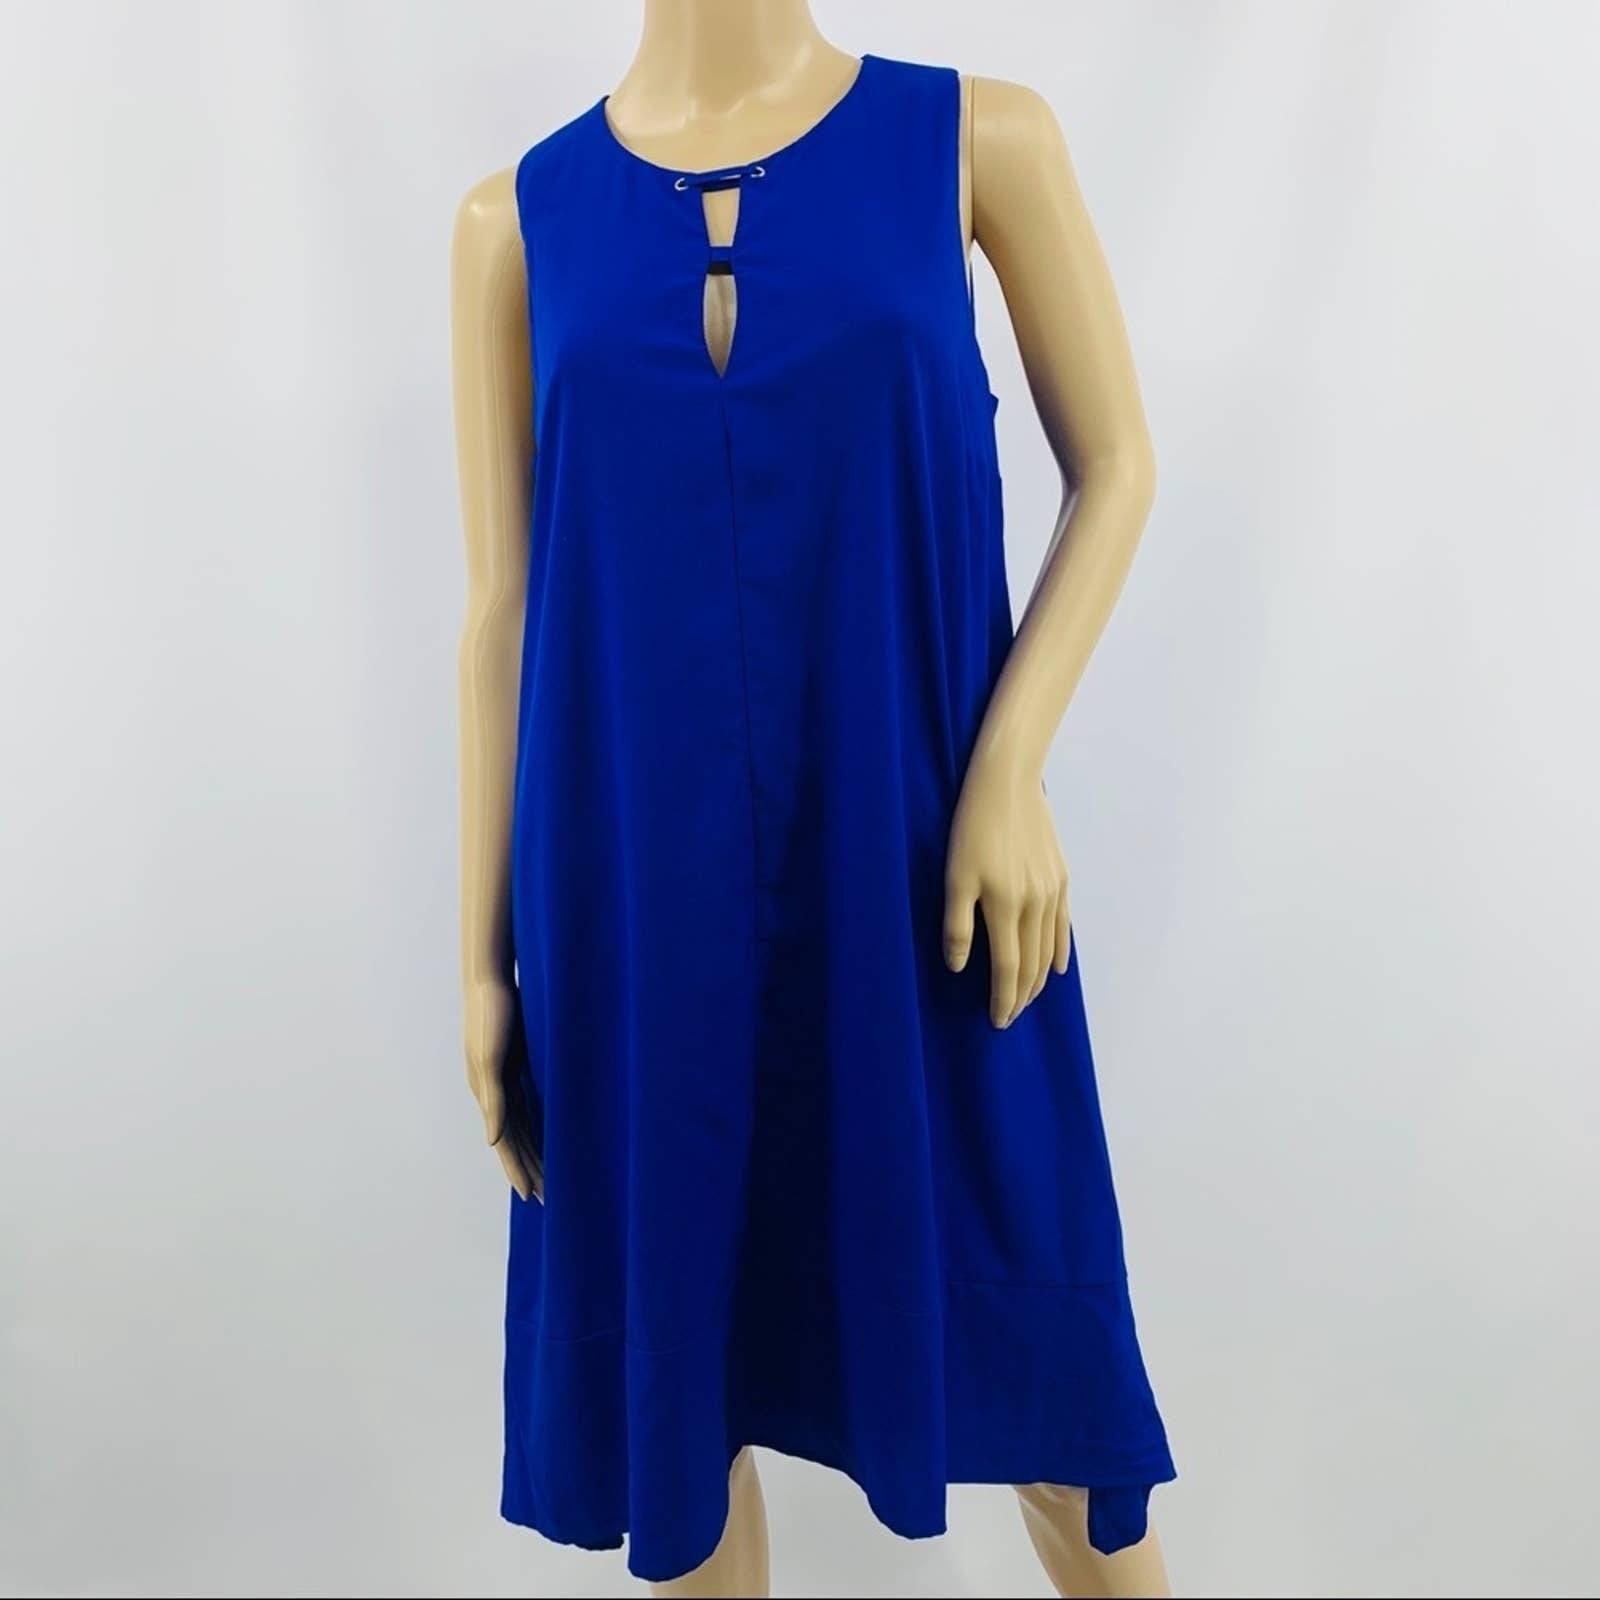 Project Runway A Line Sleeveless Dress